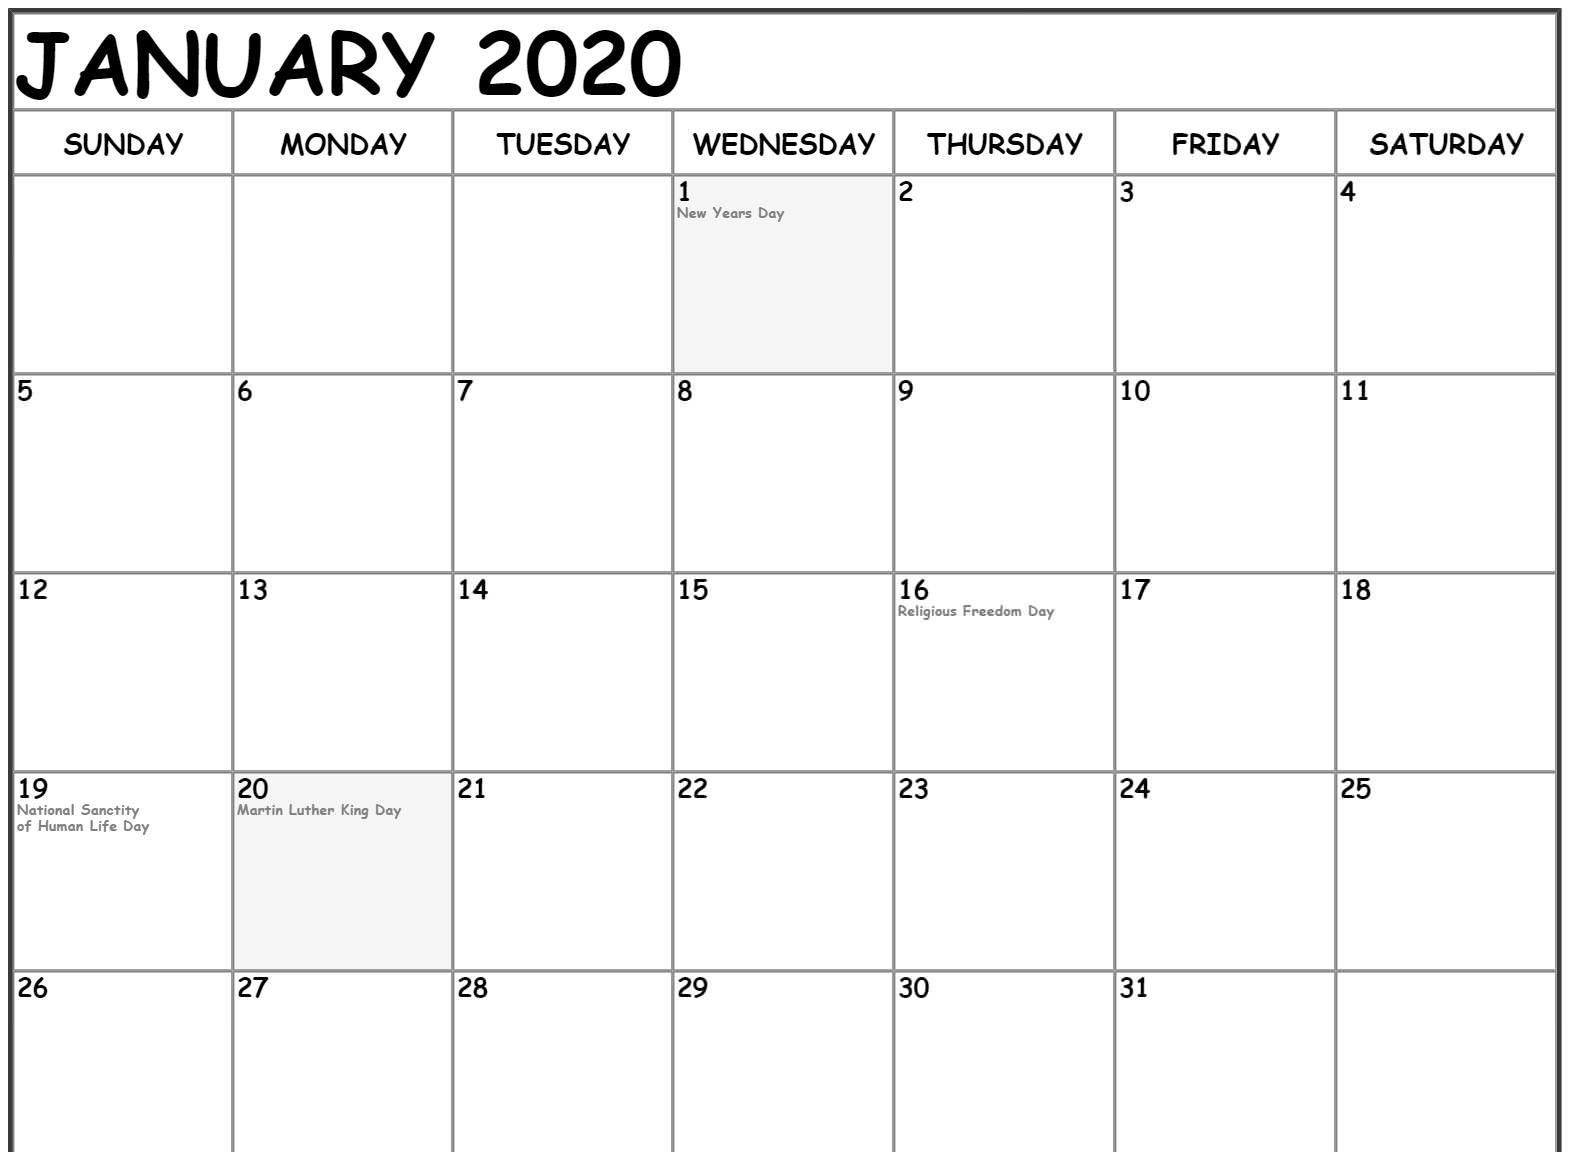 Free Fillable January Calendar 2020 Printable Editable With